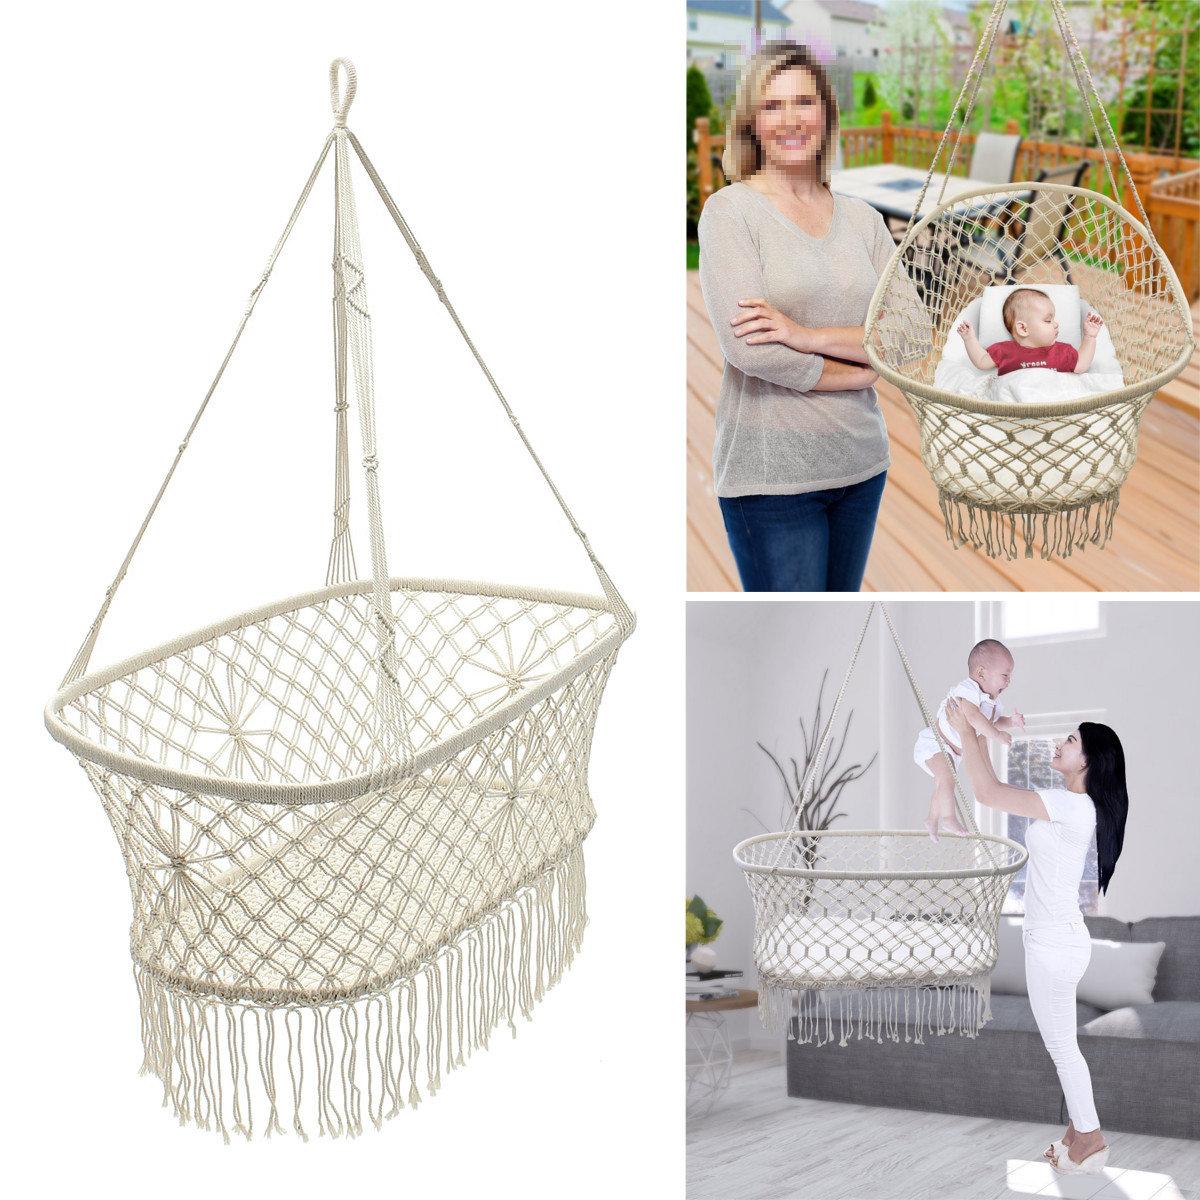 Baby Garden Hanging Hammock Cotton Woven Rope Swing Patio